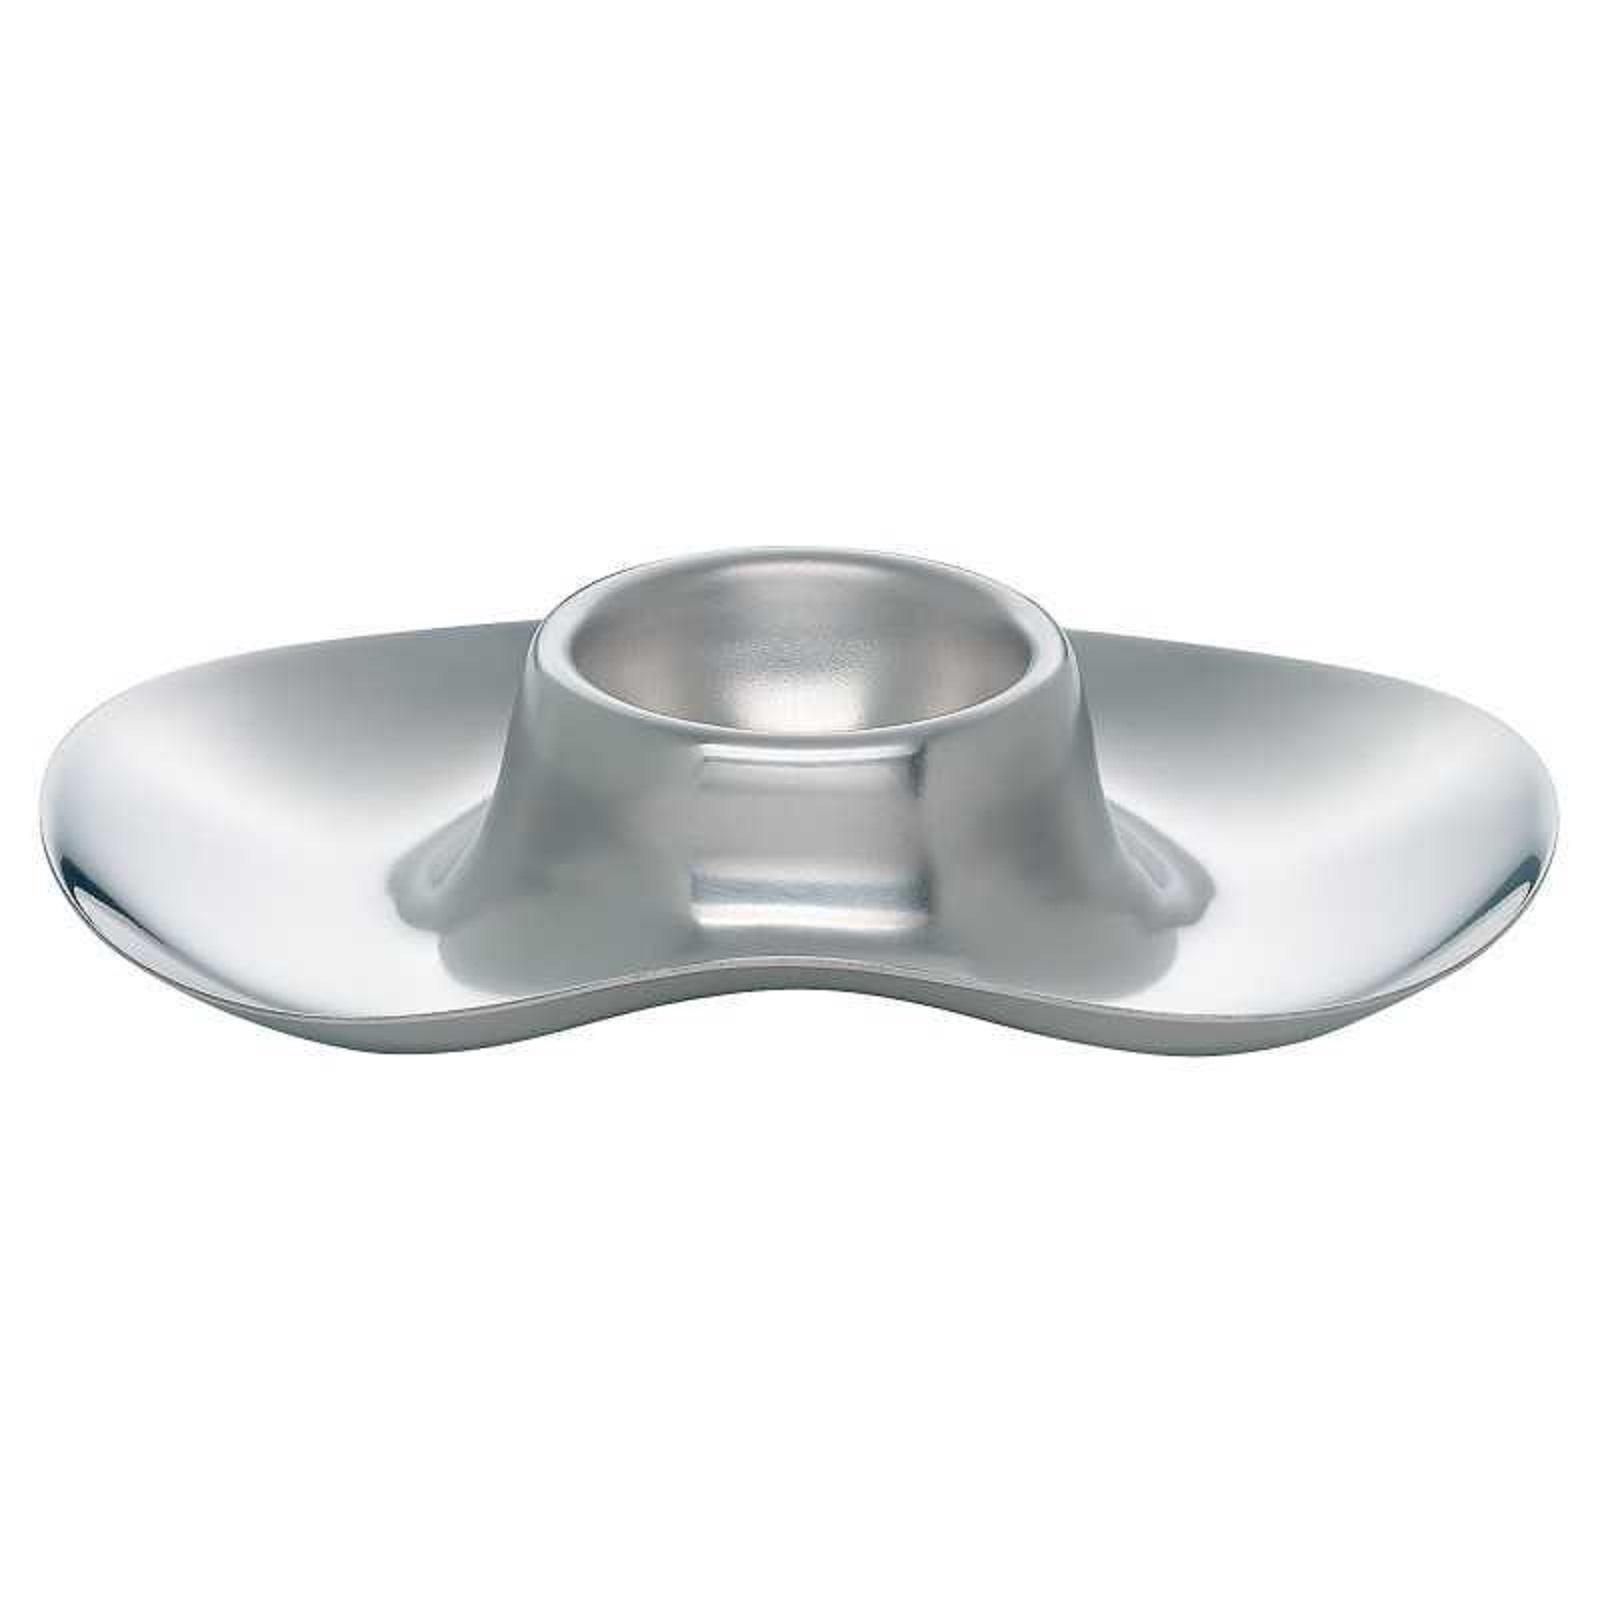 Онлайн каталог PROMENU: Подставка для яйца WMF,13,5x8,5 см, серый WMF 06 1703 9990